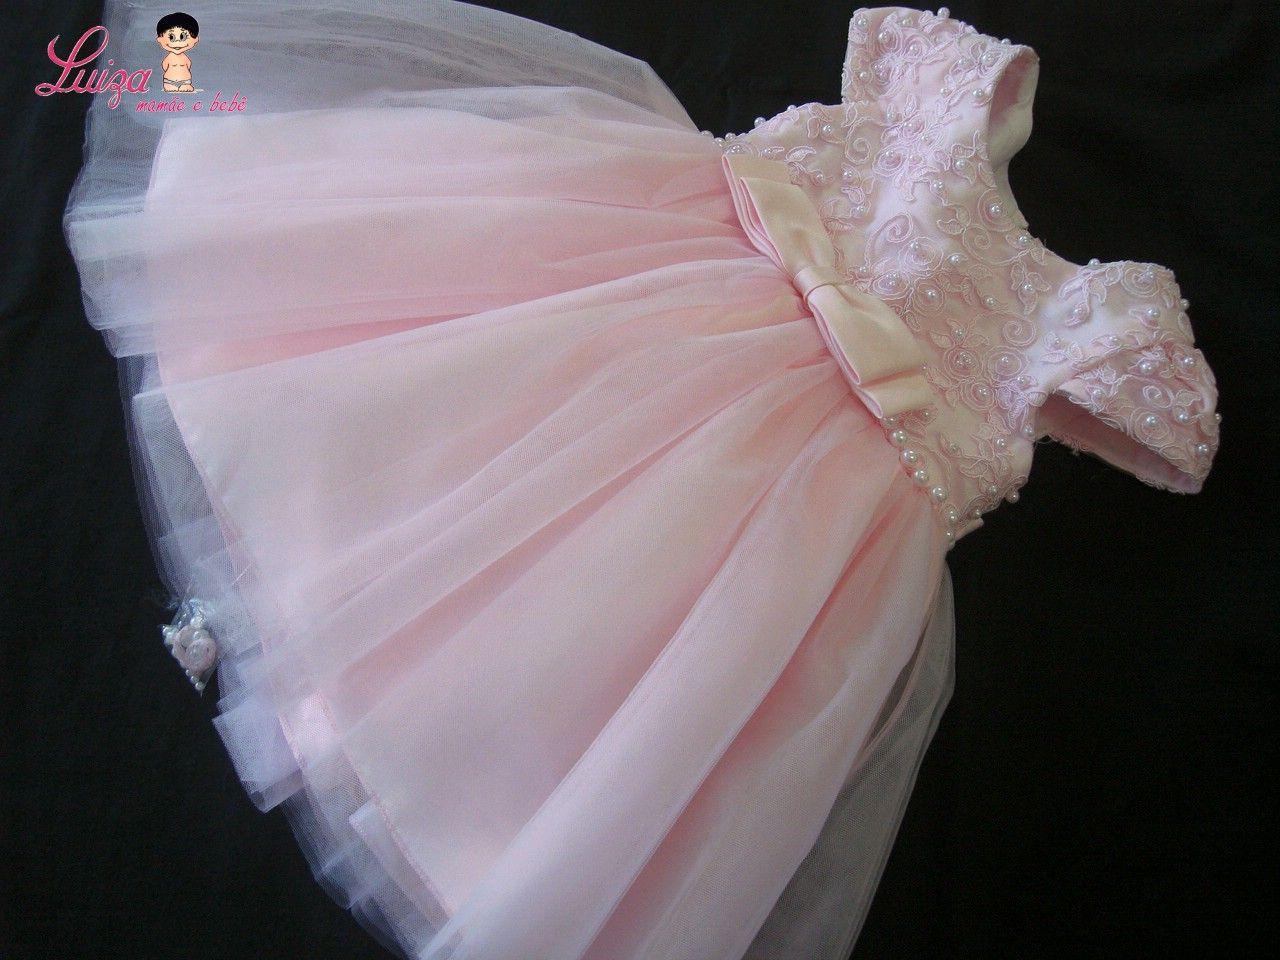 c9f56857de2 vestido de festa infantil 1 ano rosa - Pesquisa Google | vestidos ...